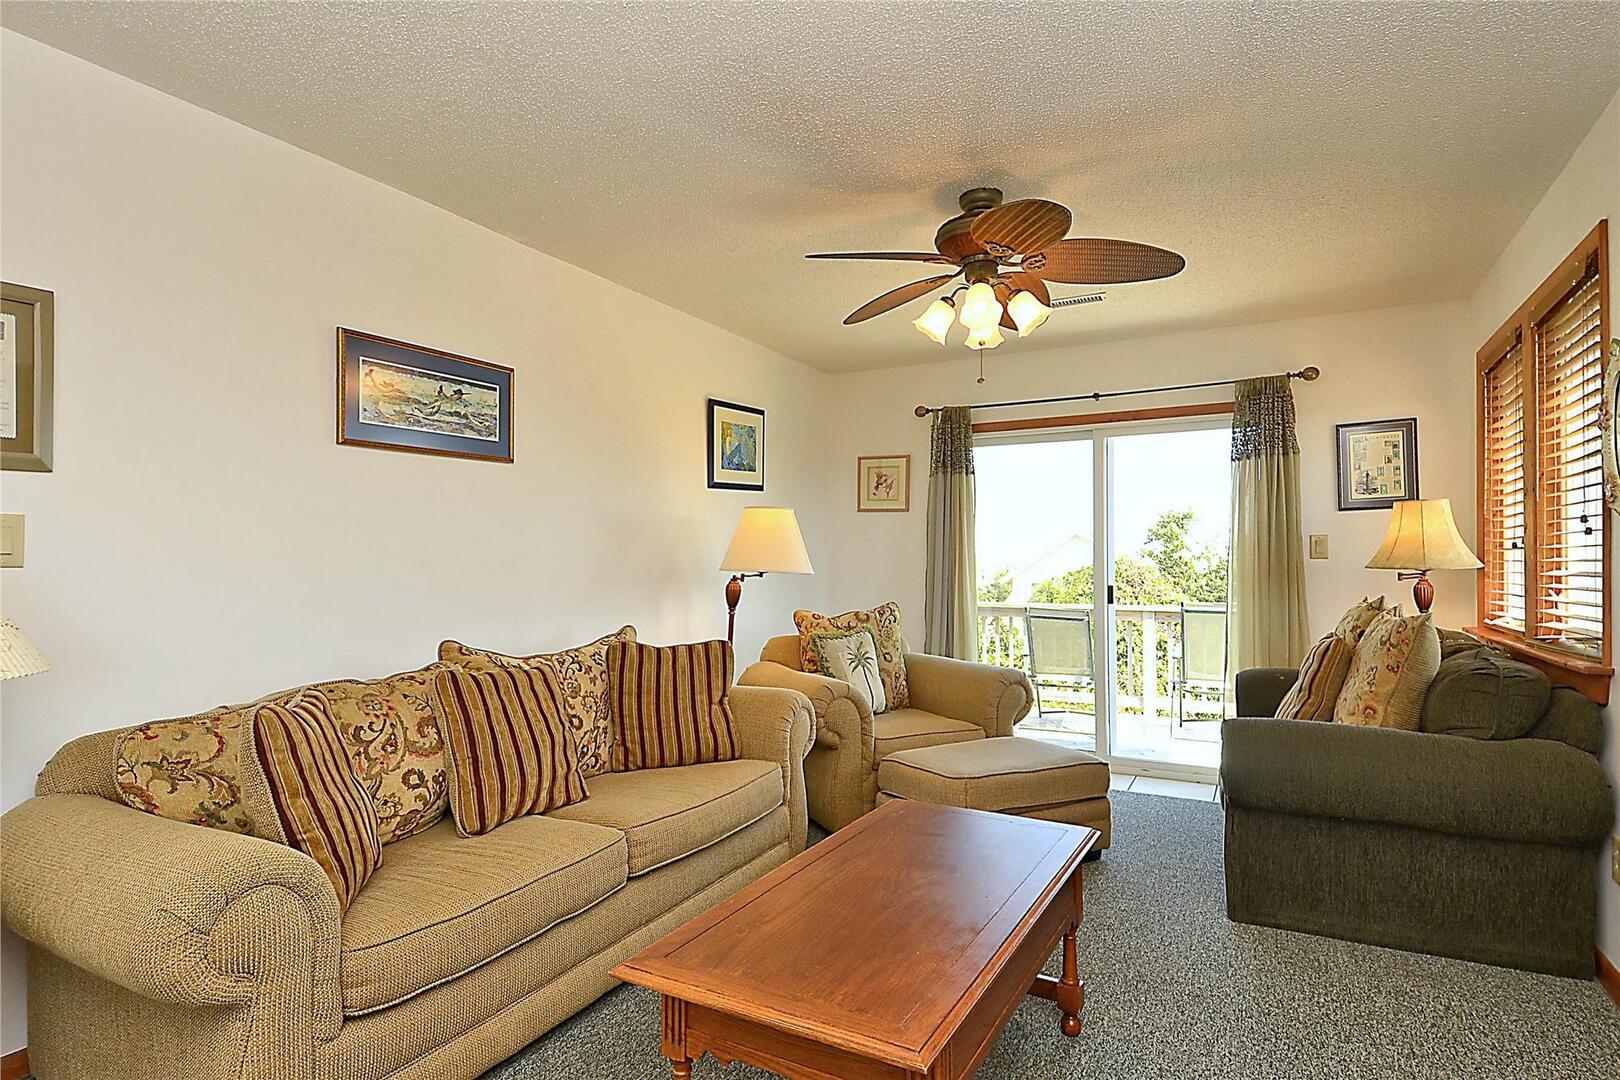 Main/Upper Level,Living Area,